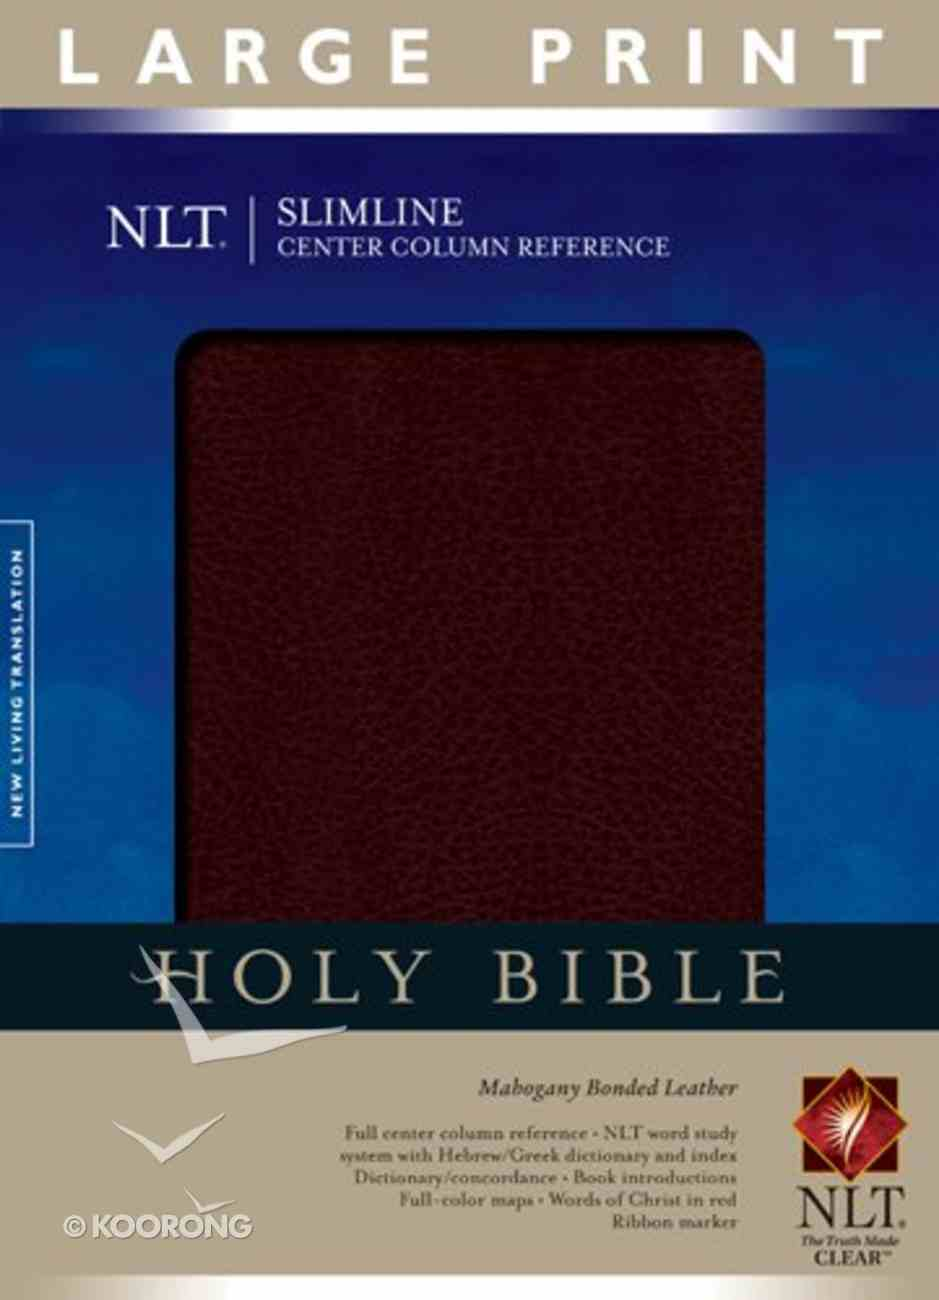 NLT Slimline Center Column Reference Large Print Mahogany (Red Letter Edition) Bonded Leather